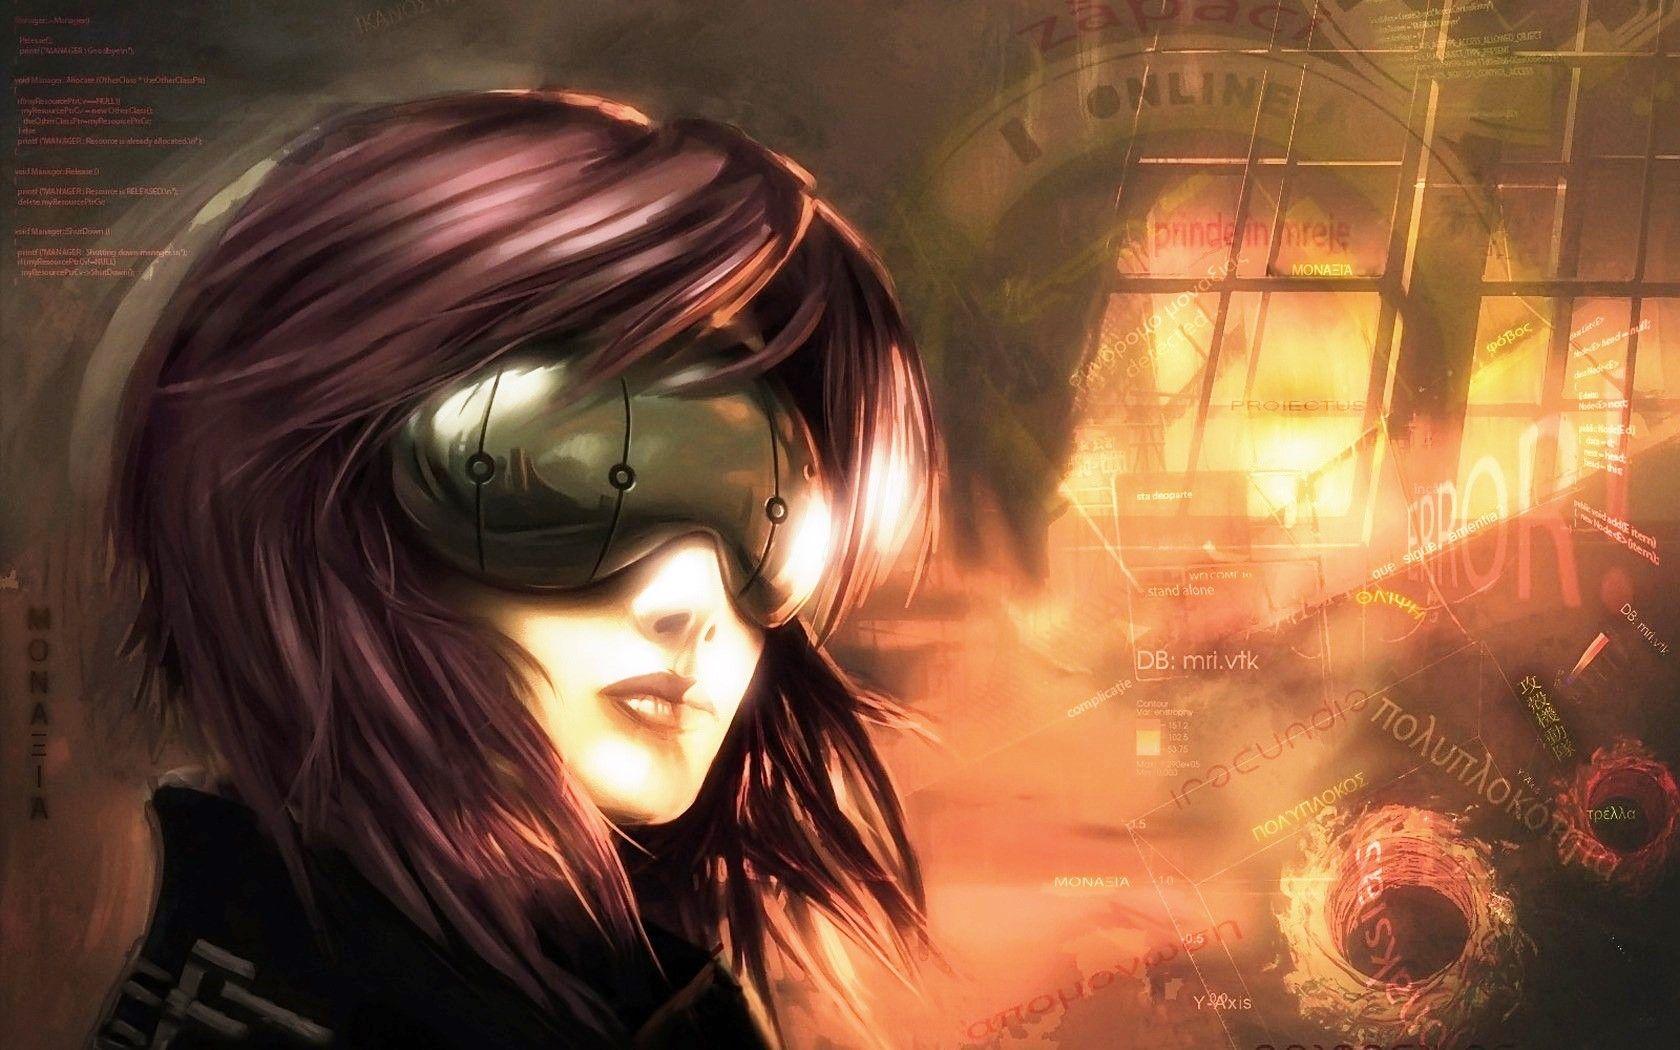 Motoko Kusanagi Ghost In The Shell Anime And Manga Series